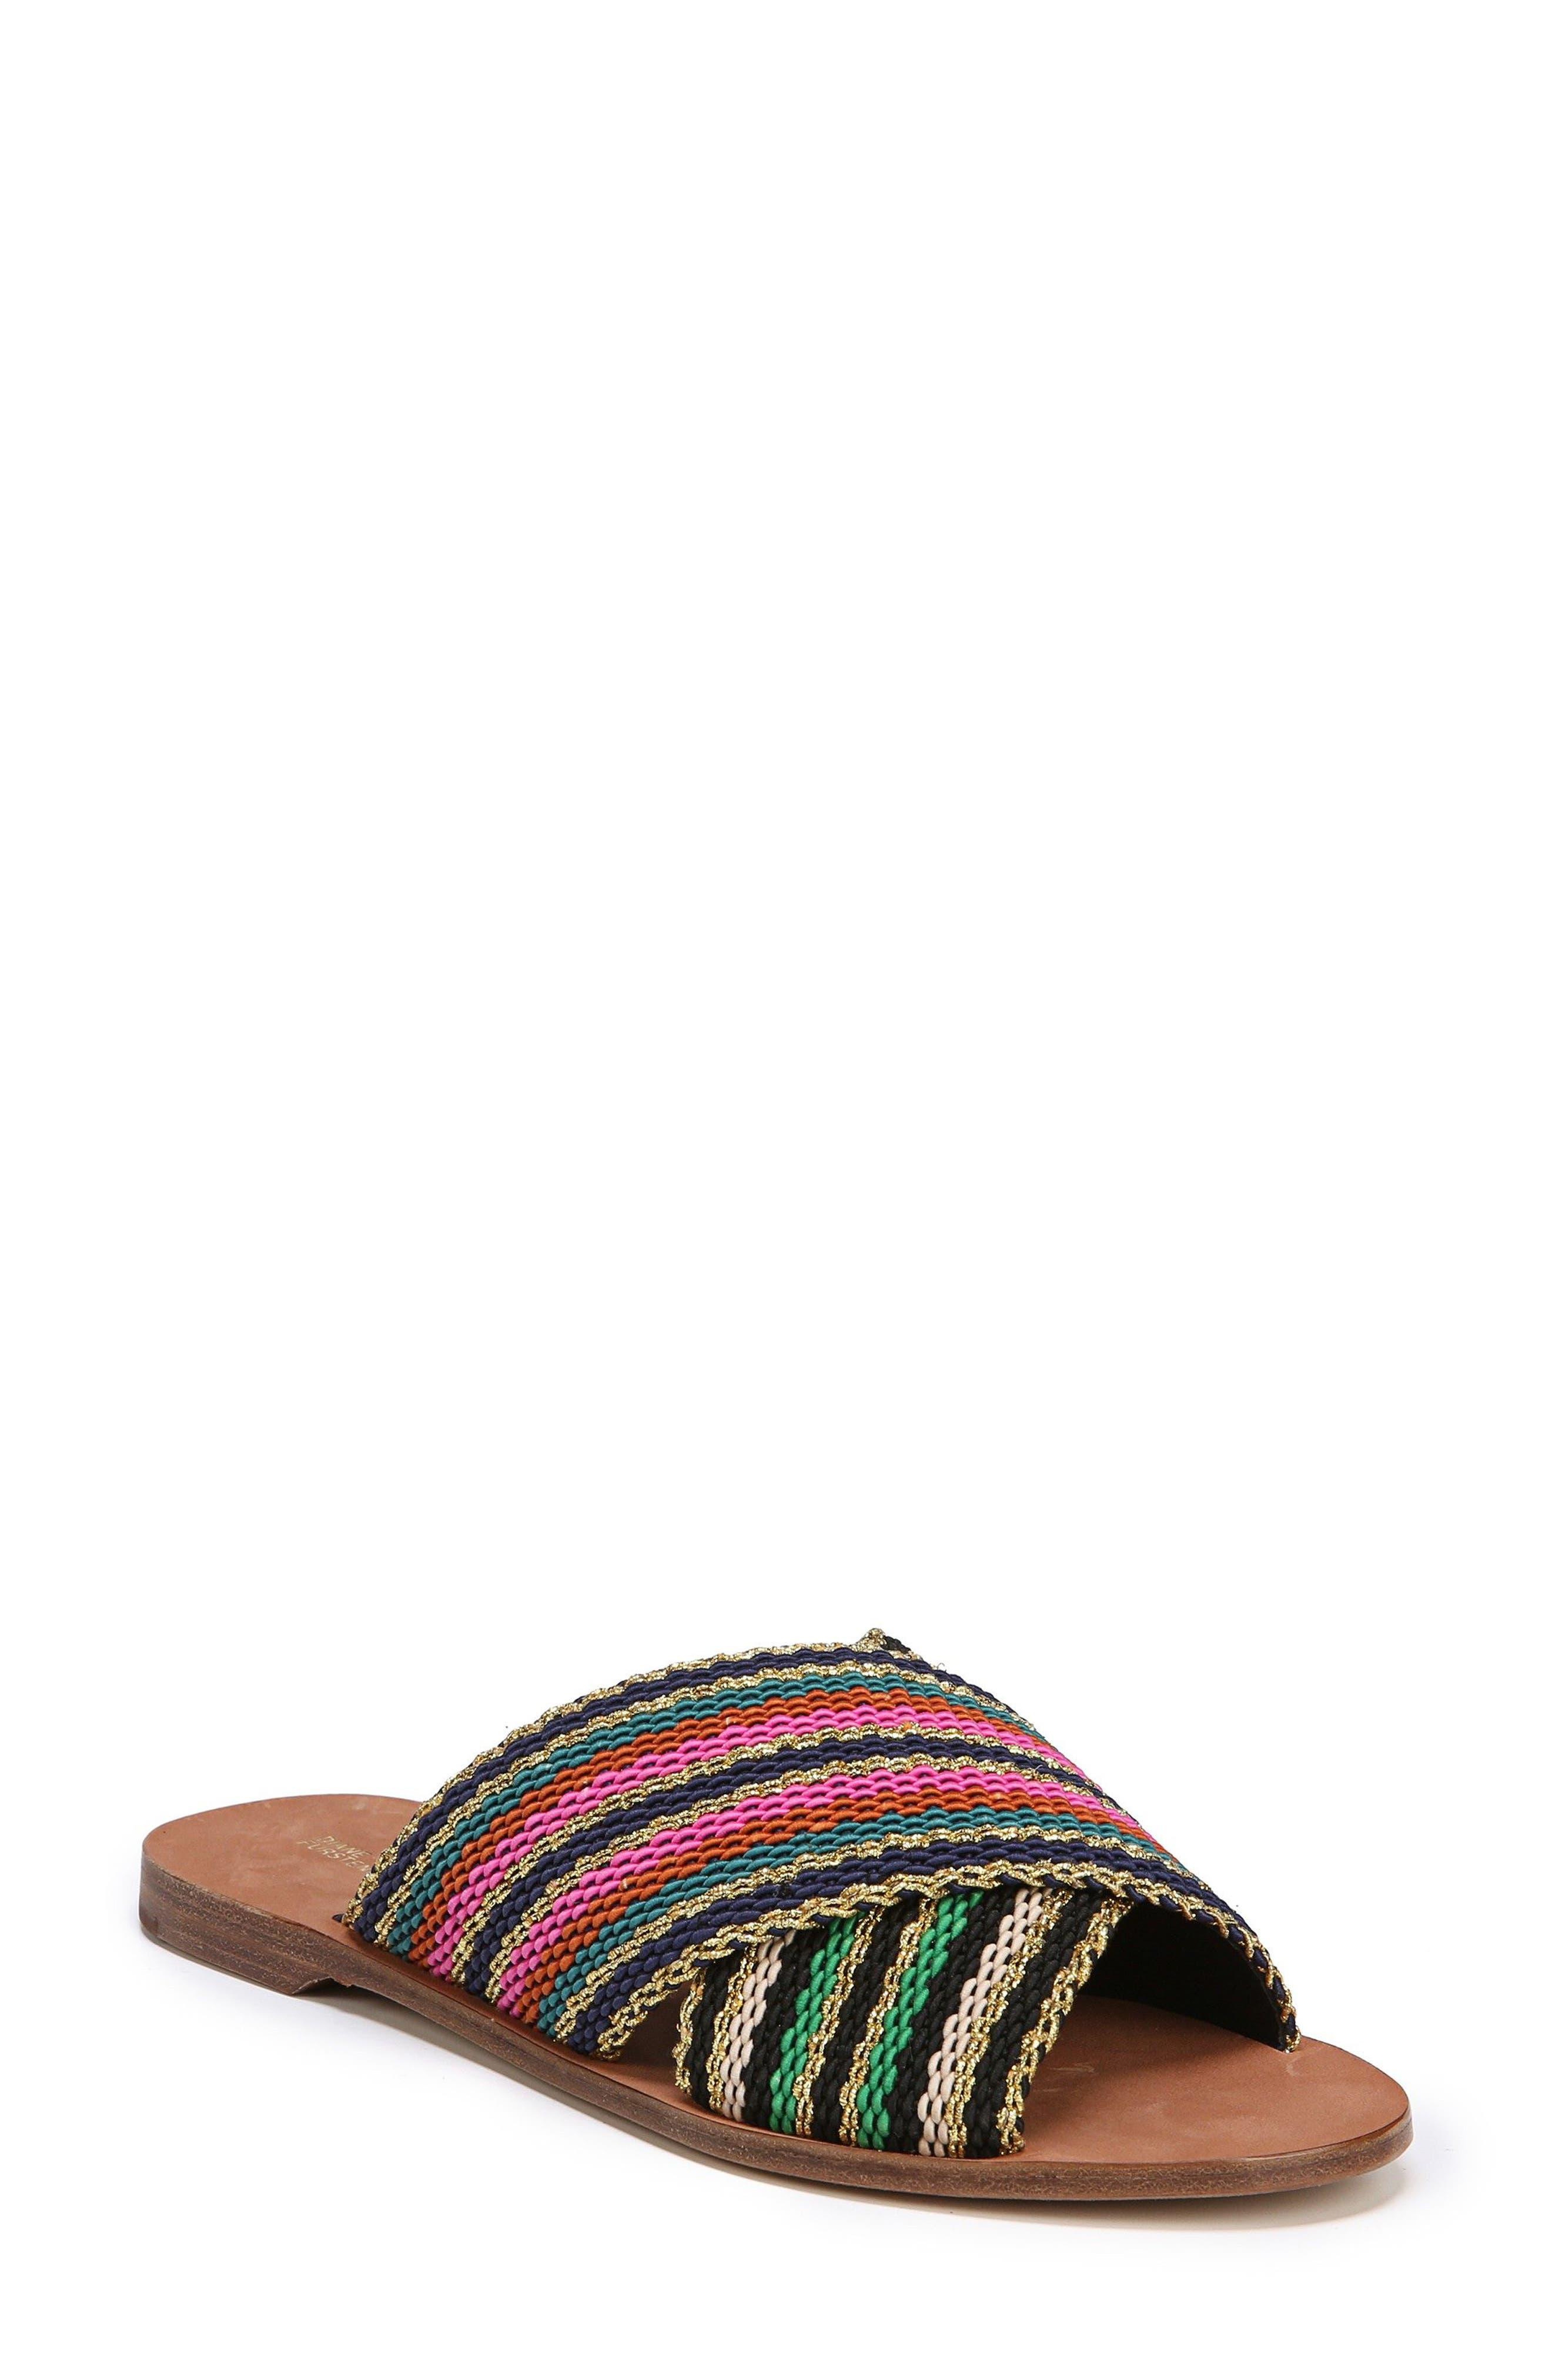 Best Supplier Diane Von Furstenberg Woman Farah Suede Slingback Sandals Black Size 9.5 Diane Von F Outlet Footlocker Pictures Discount For Cheap Discount Manchester Marketable zGFOQeMh